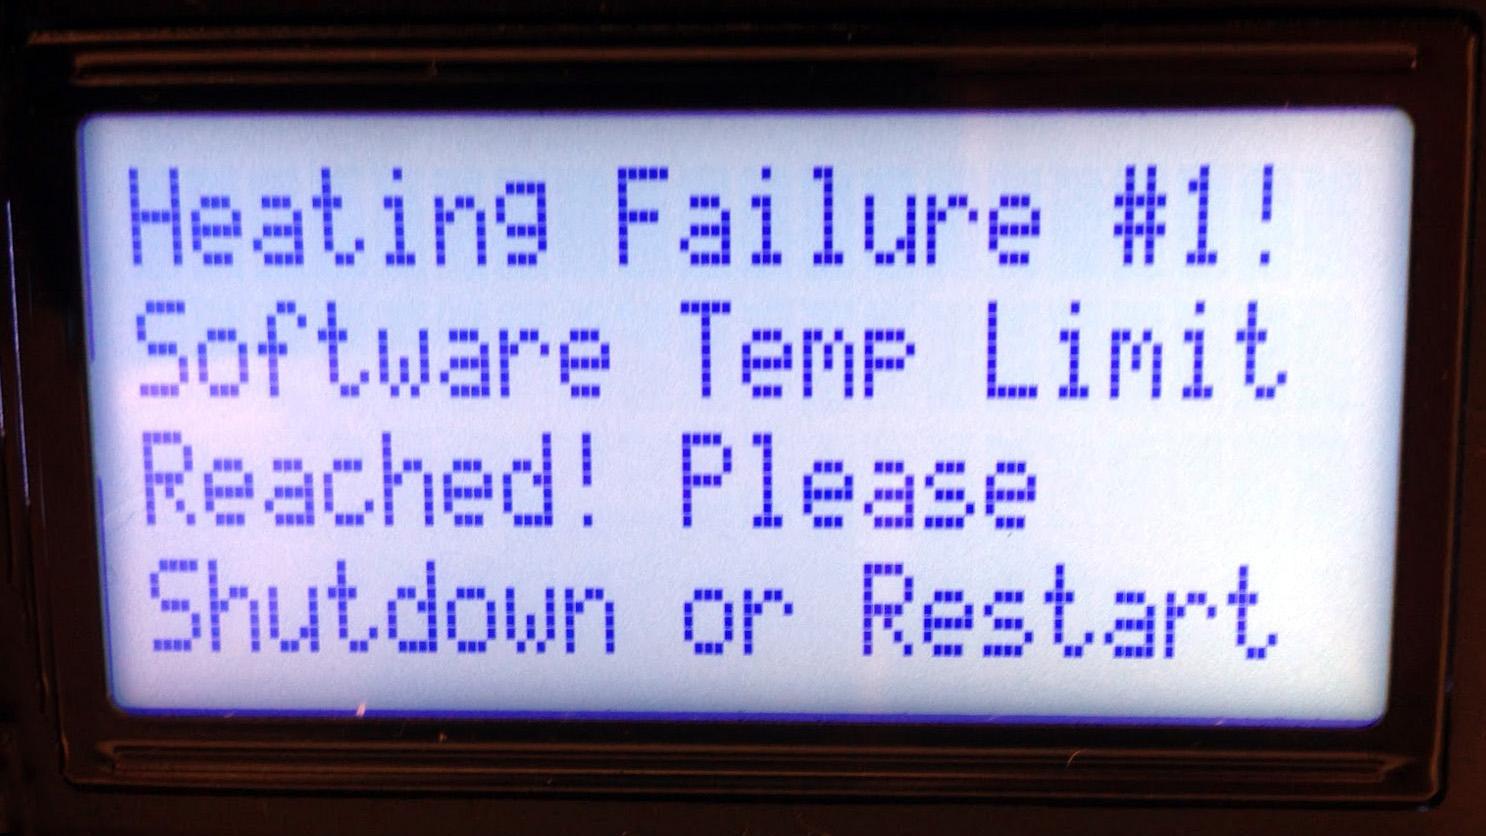 Troubleshooting the MakerBot Replicator 2 - Fargo 3D Printing